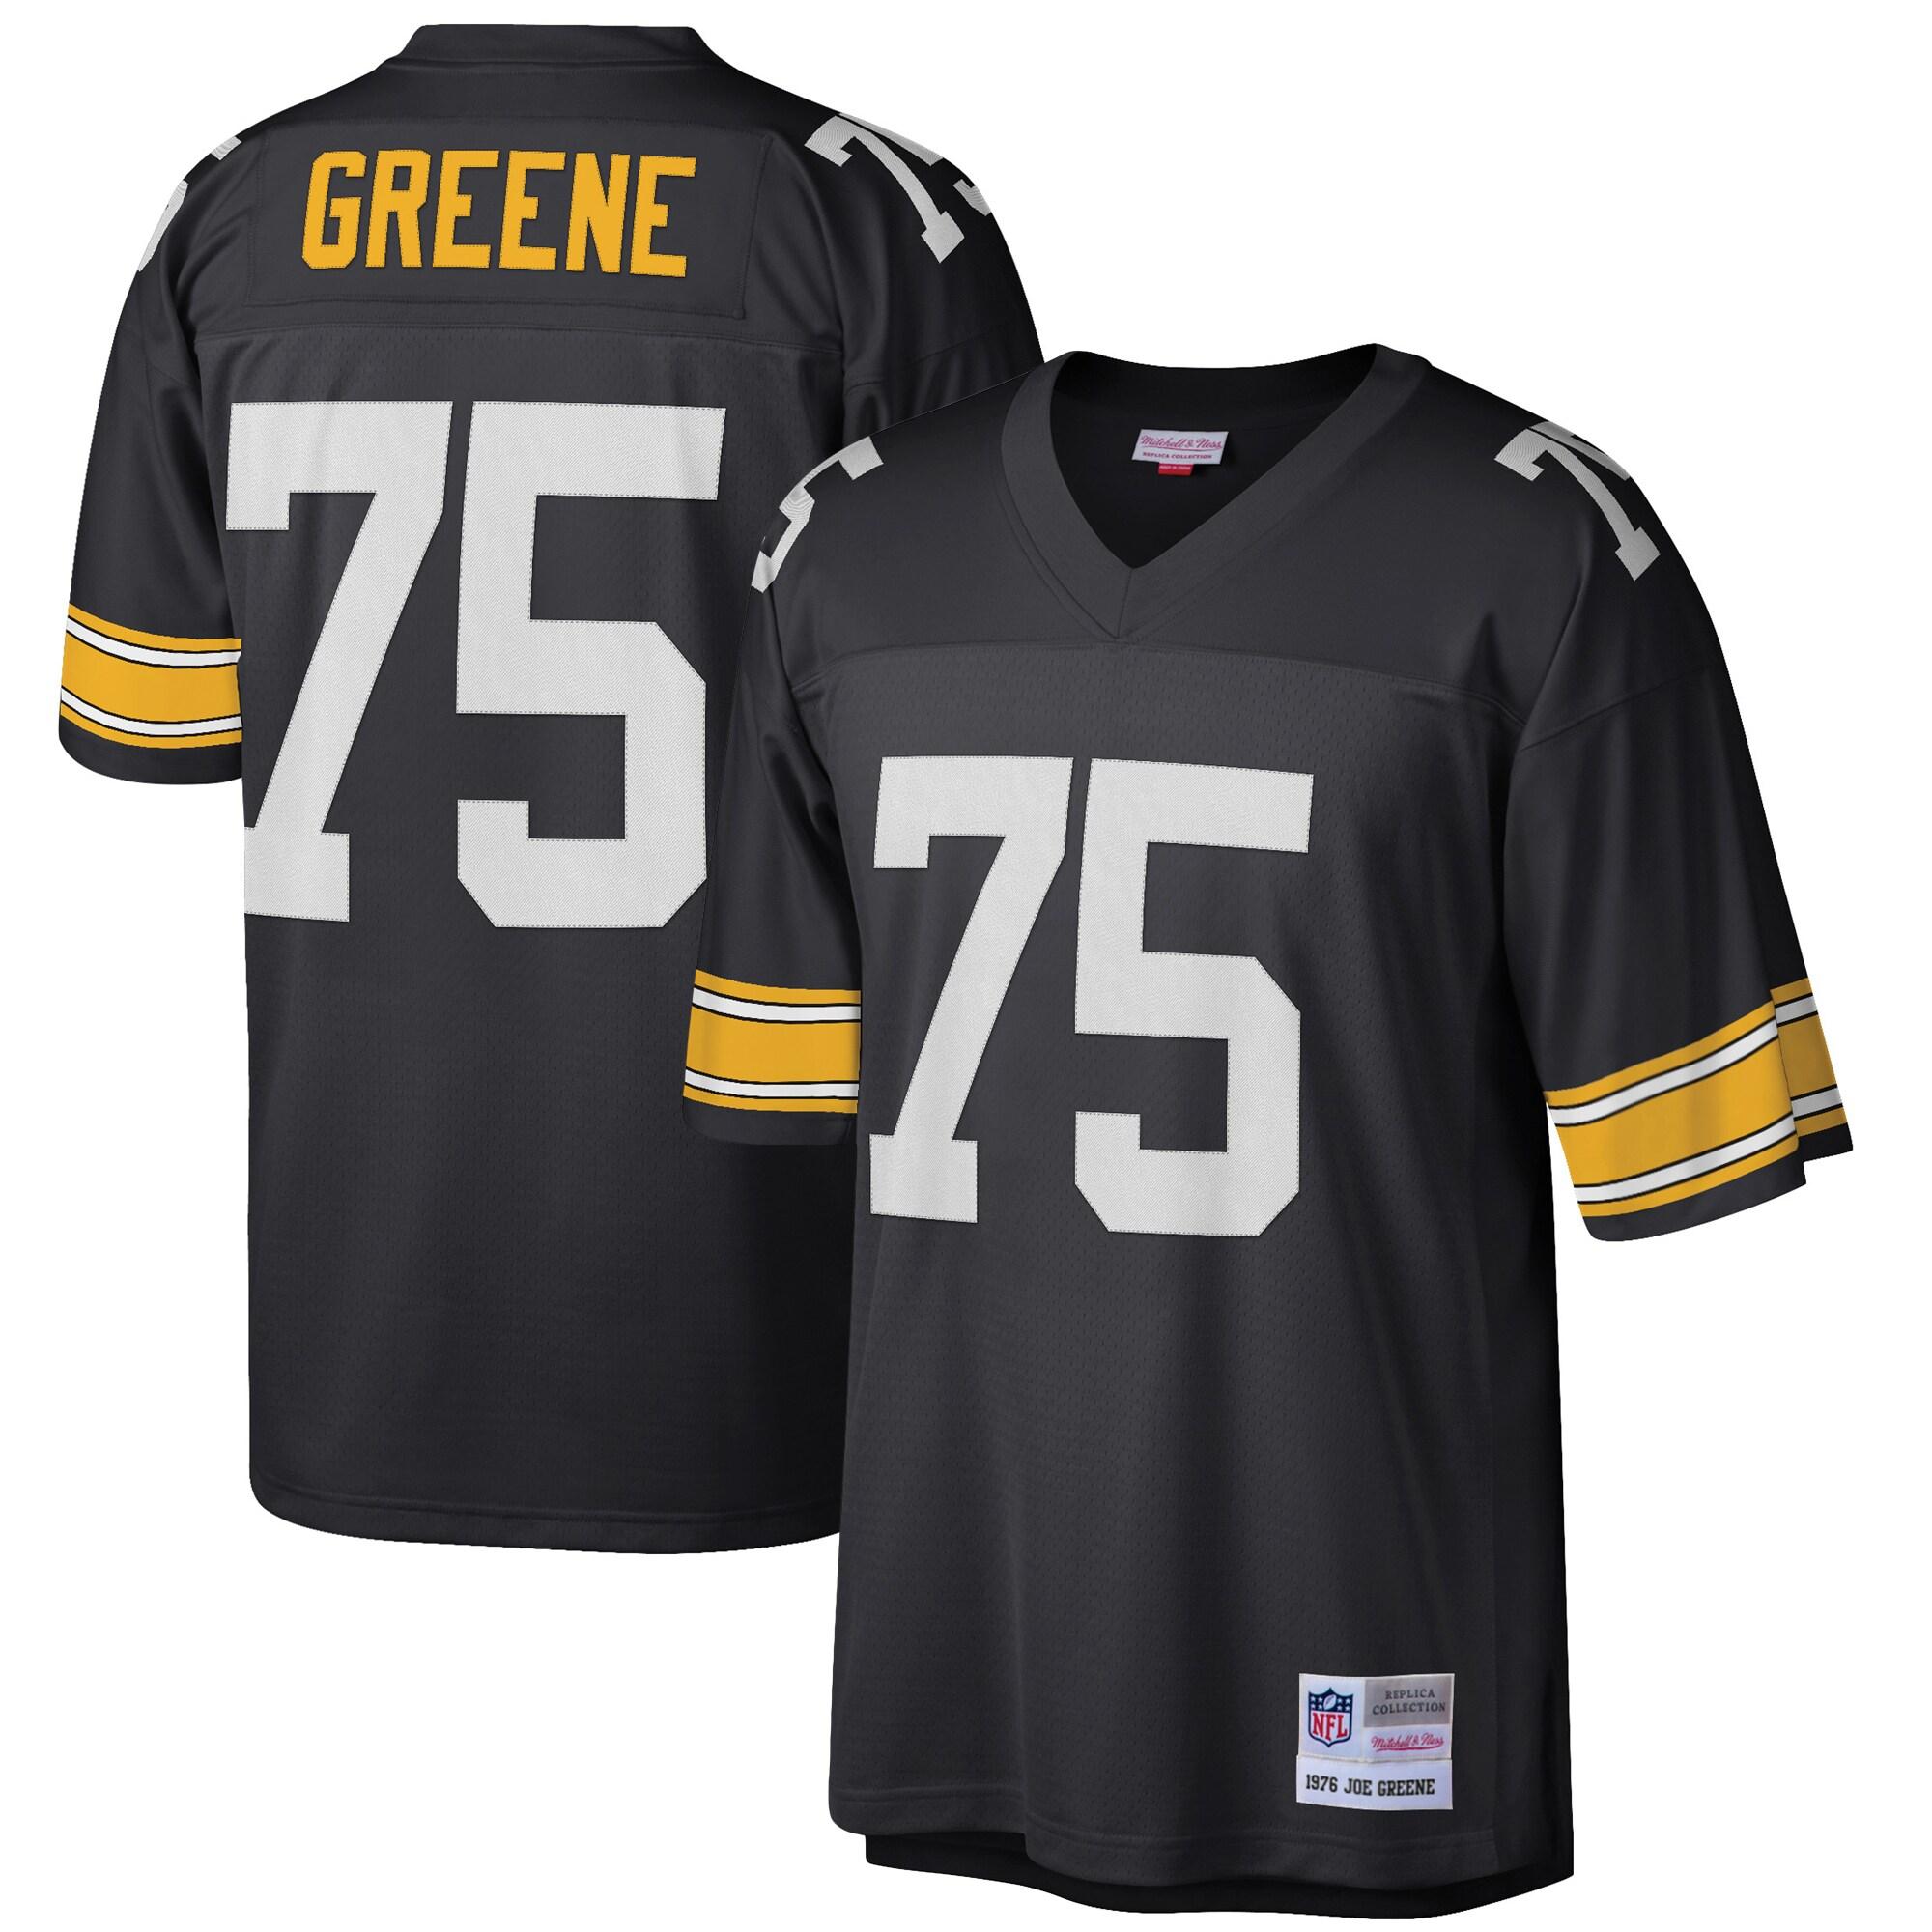 Joe Greene Pittsburgh Steelers Mitchell & Ness Retired Player Legacy Replica Jersey - Black